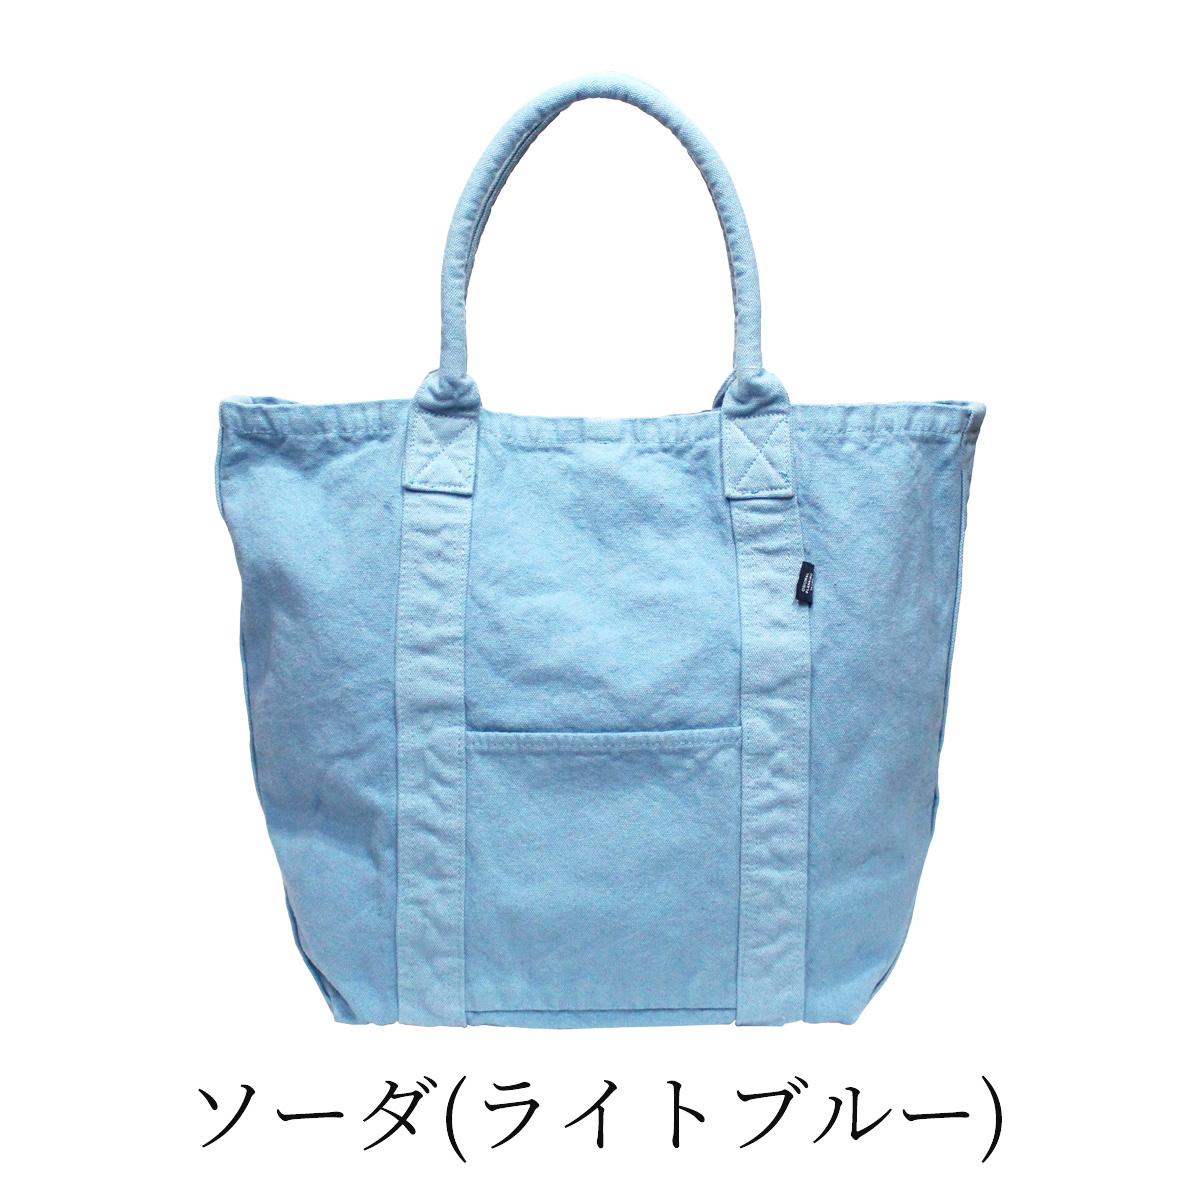 【MAKEUP】倉敷帆布 製品染め フロントポケットトート L 11カラー